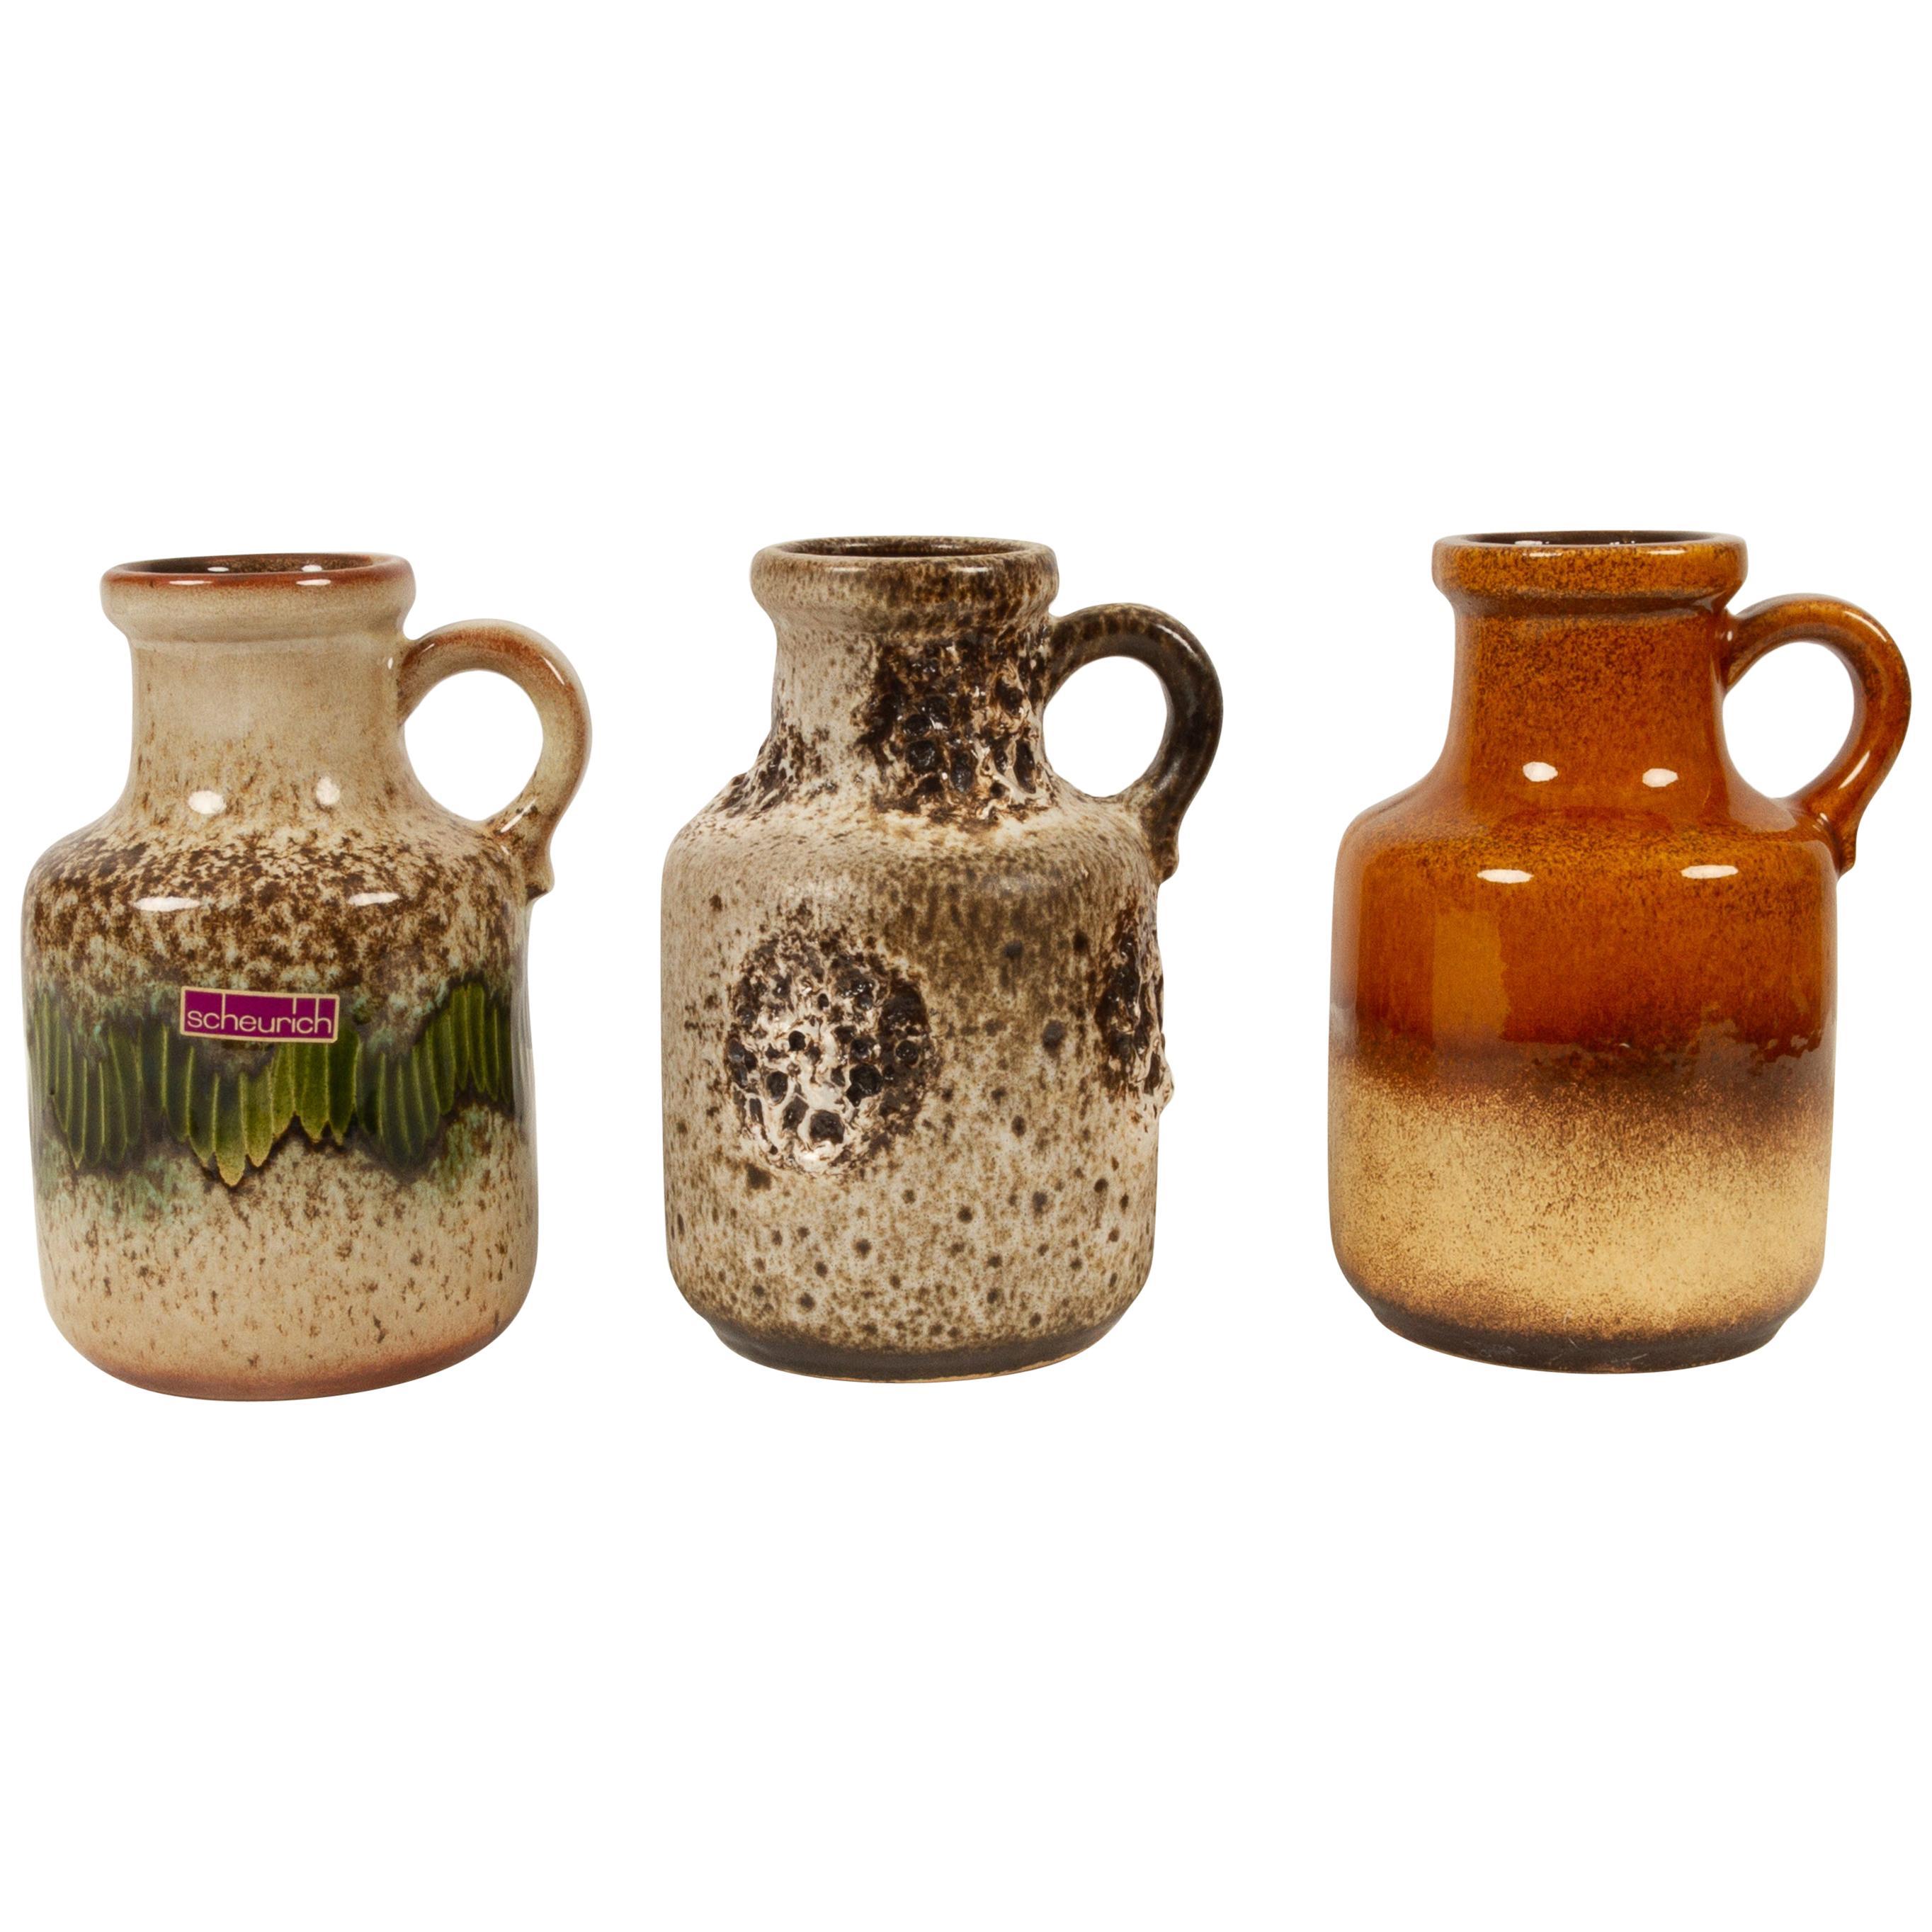 Vintage West Germany Vases Set of 3, 1970s